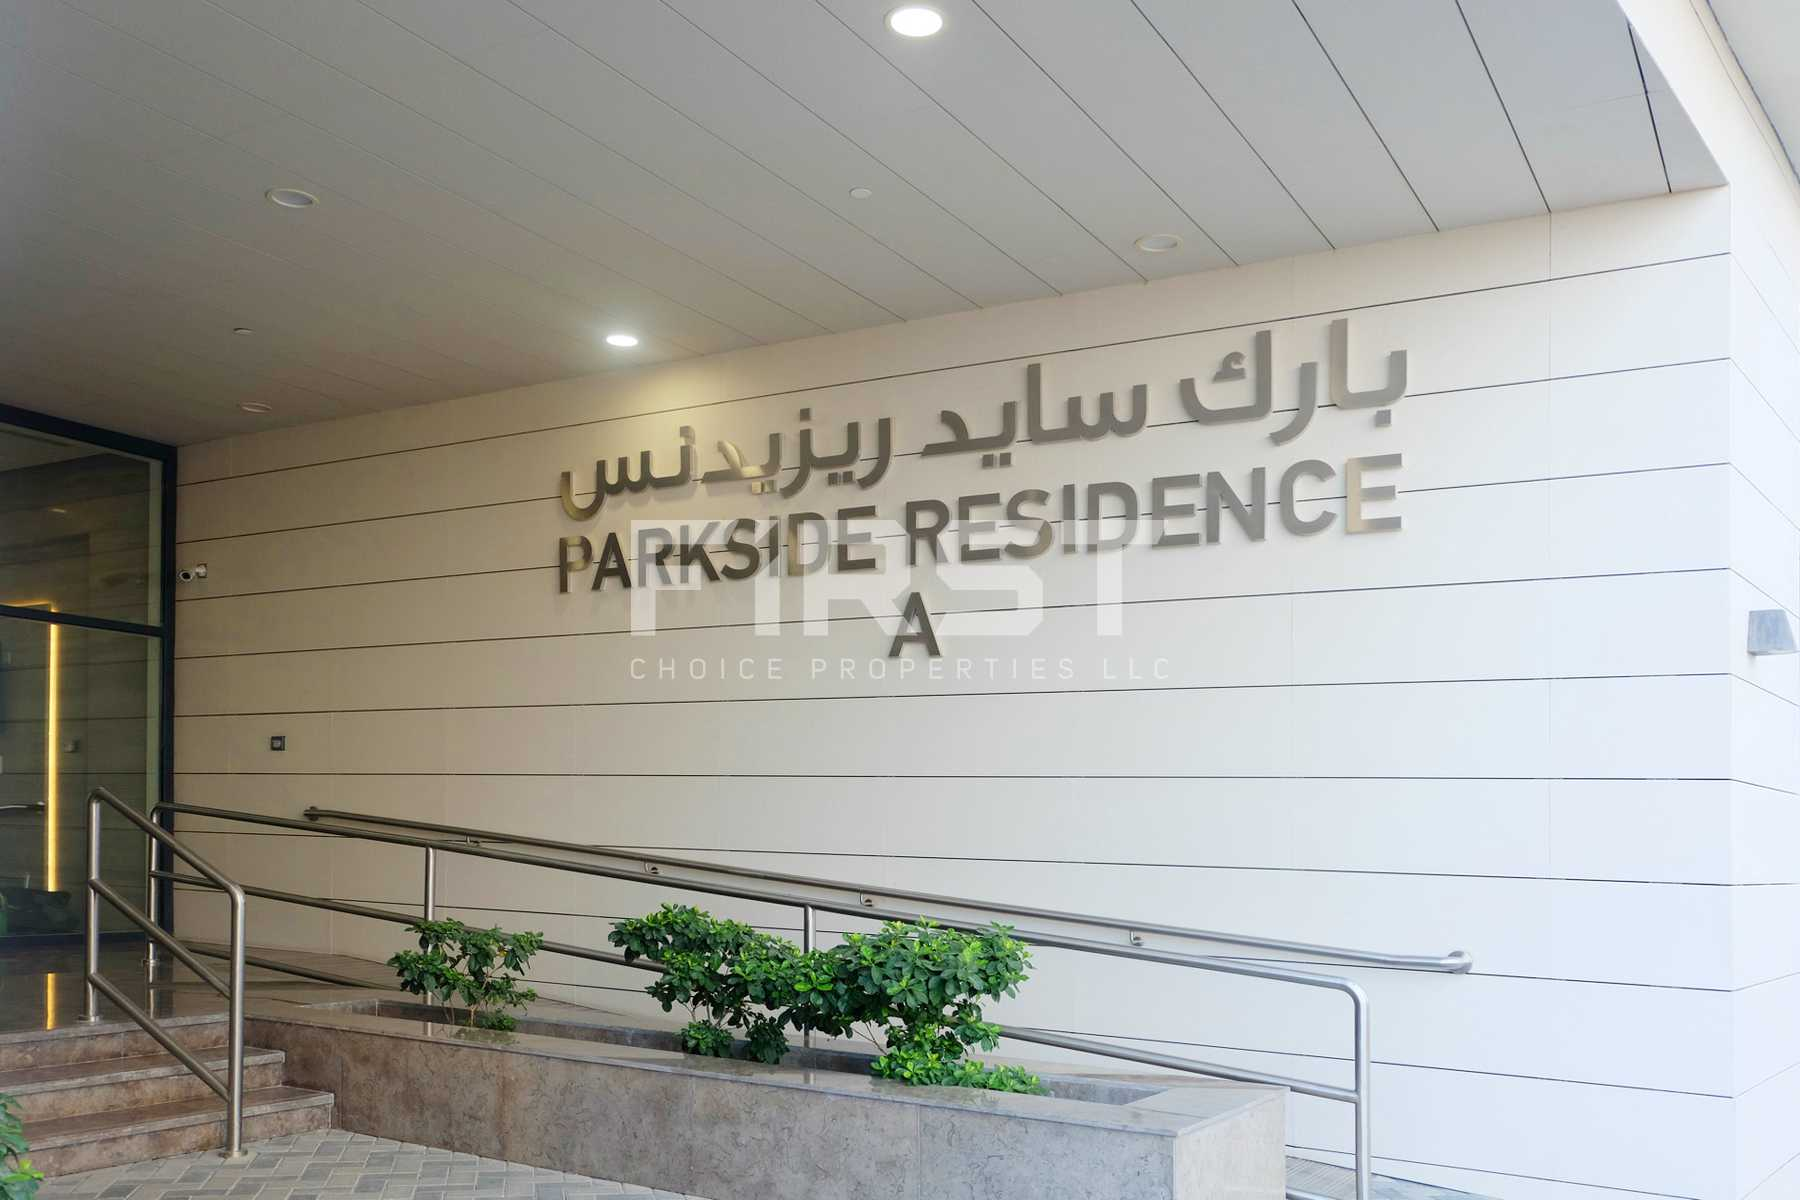 External Photo of Parkside Residence Shams Abu Dhabi UAE (3).jpg